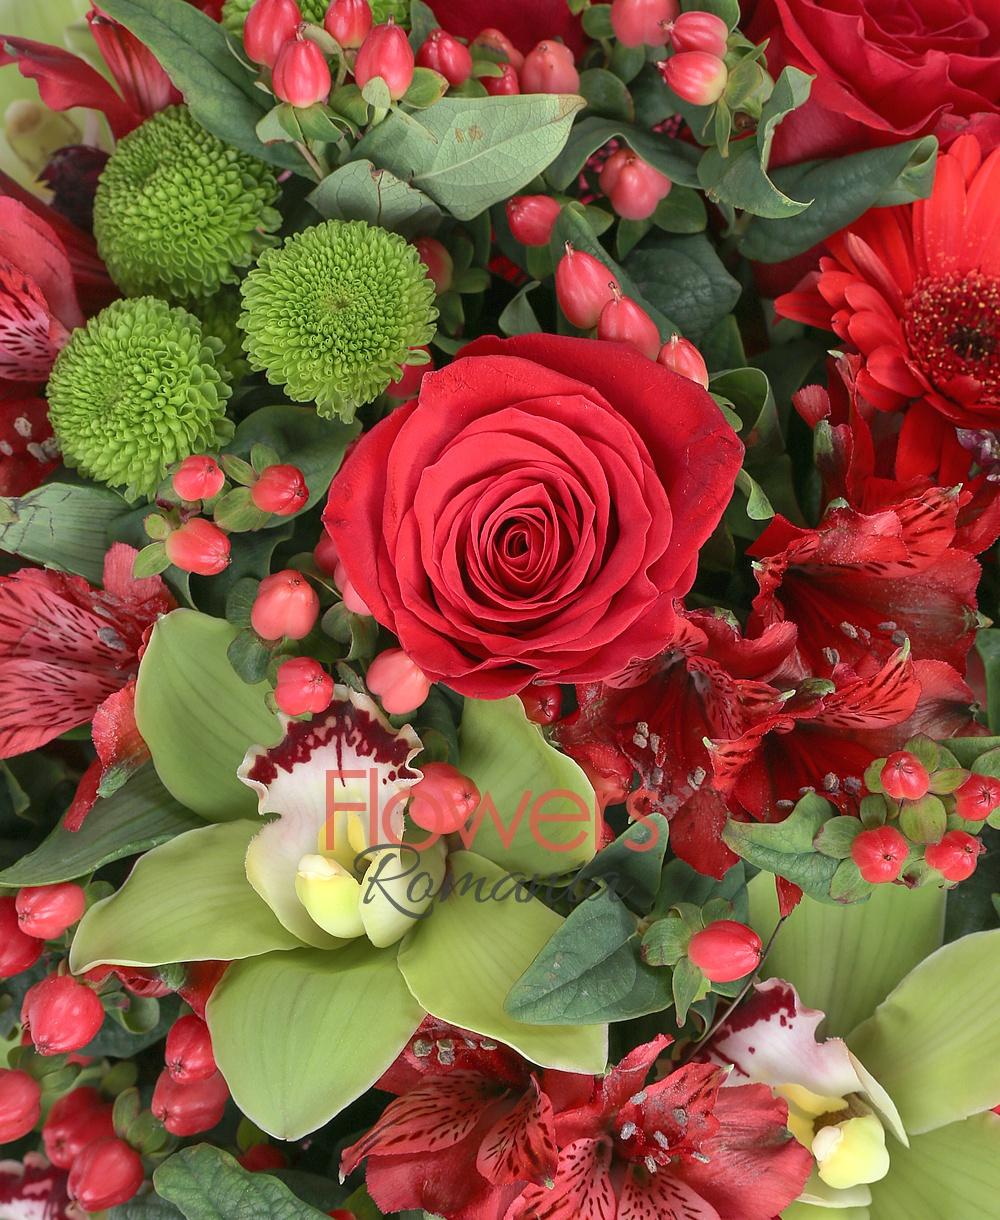 Livrare sensuality at its best bouquet gerbera roses santini sensuality at its best izmirmasajfo